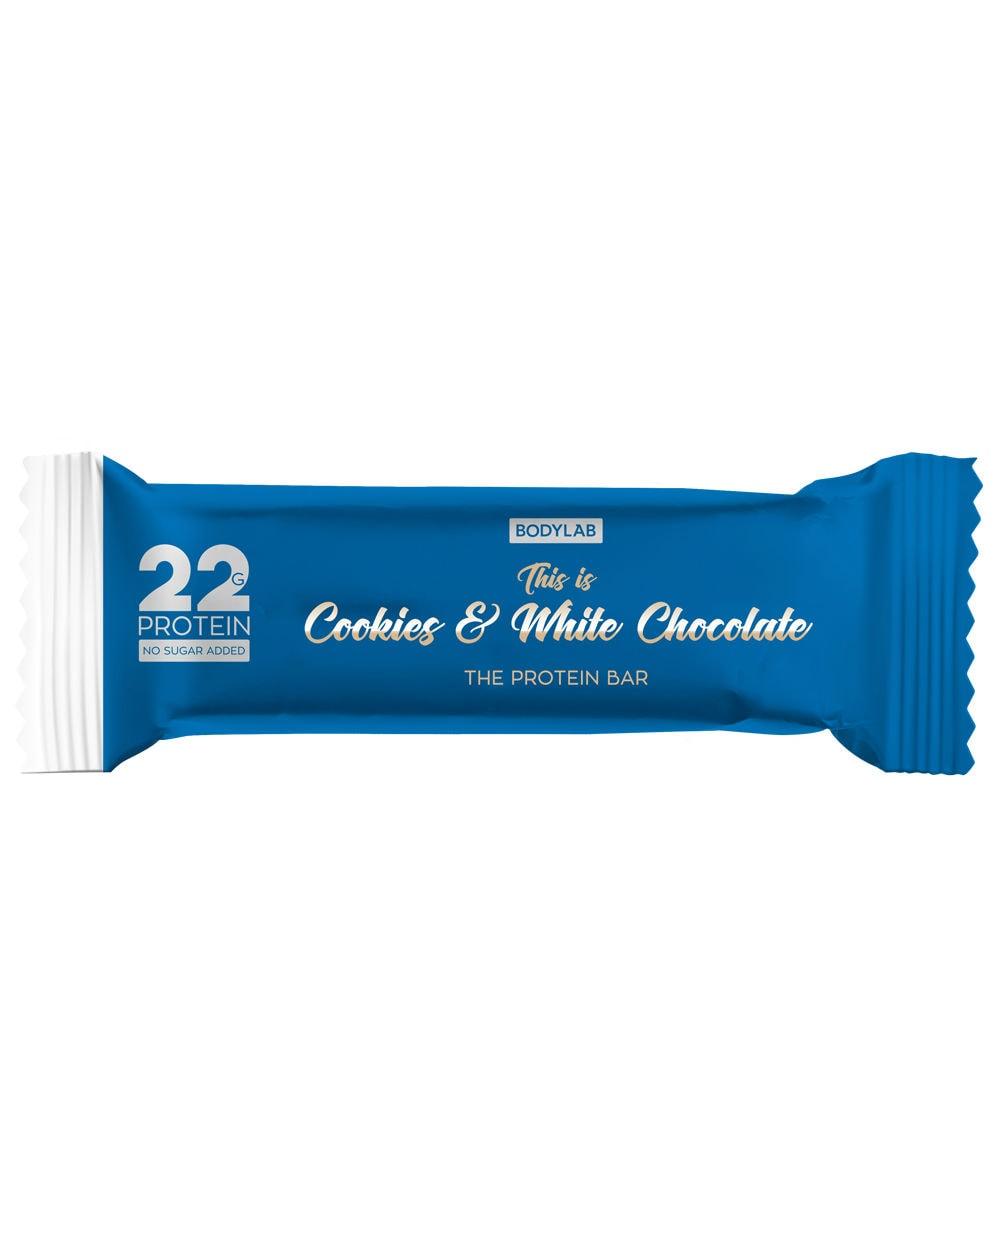 bodylab_theproteinbar_cookies_and_white_chocolate_bar